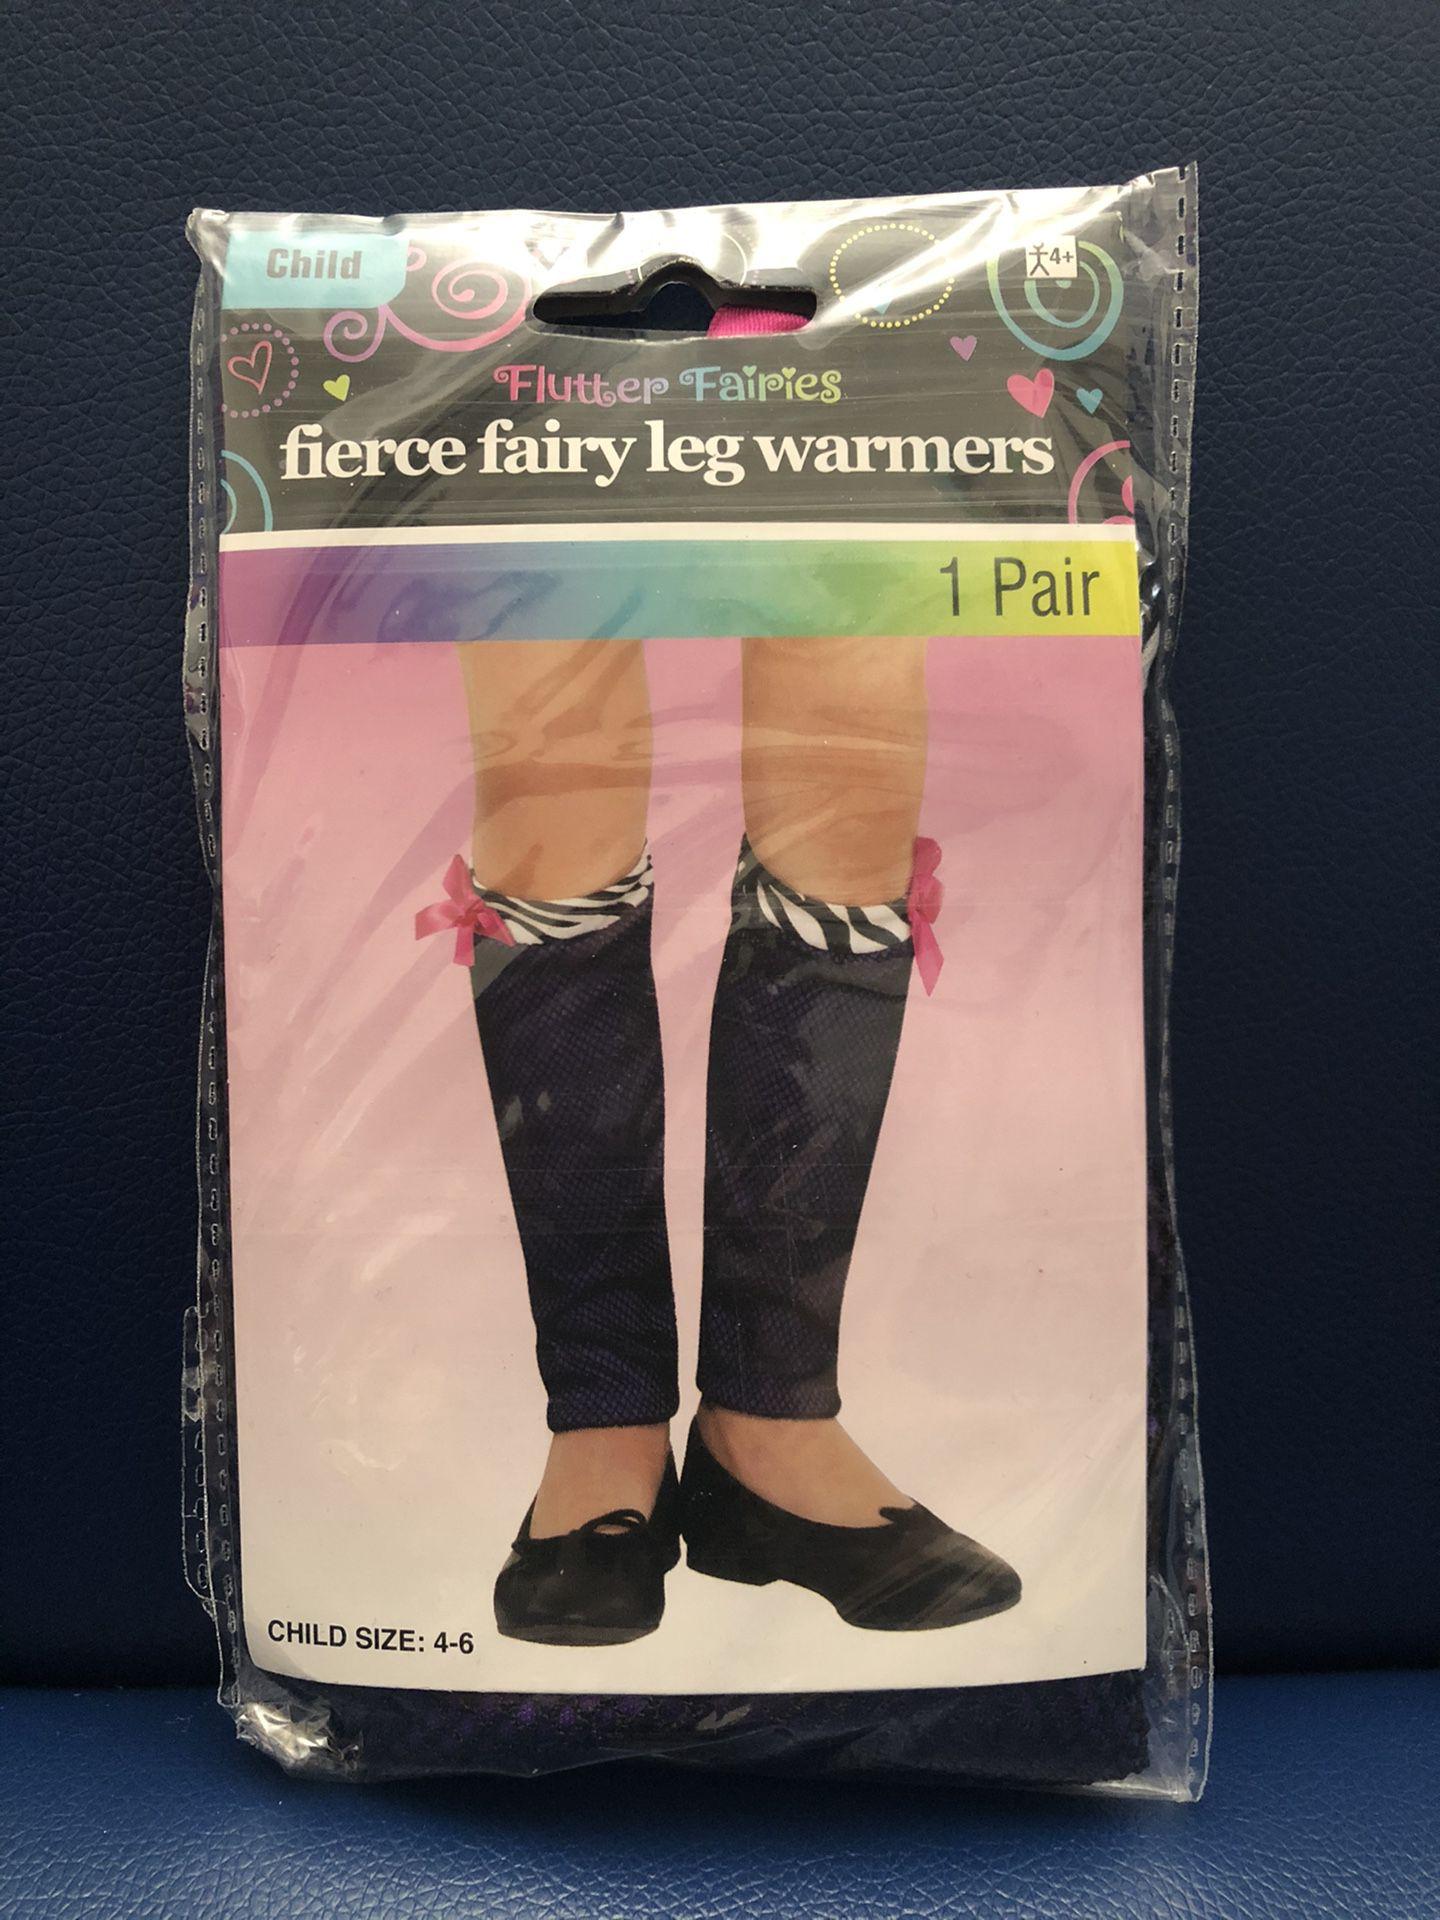 Child Fierce Fairly Leg Warmers - (Halloween) New never worn